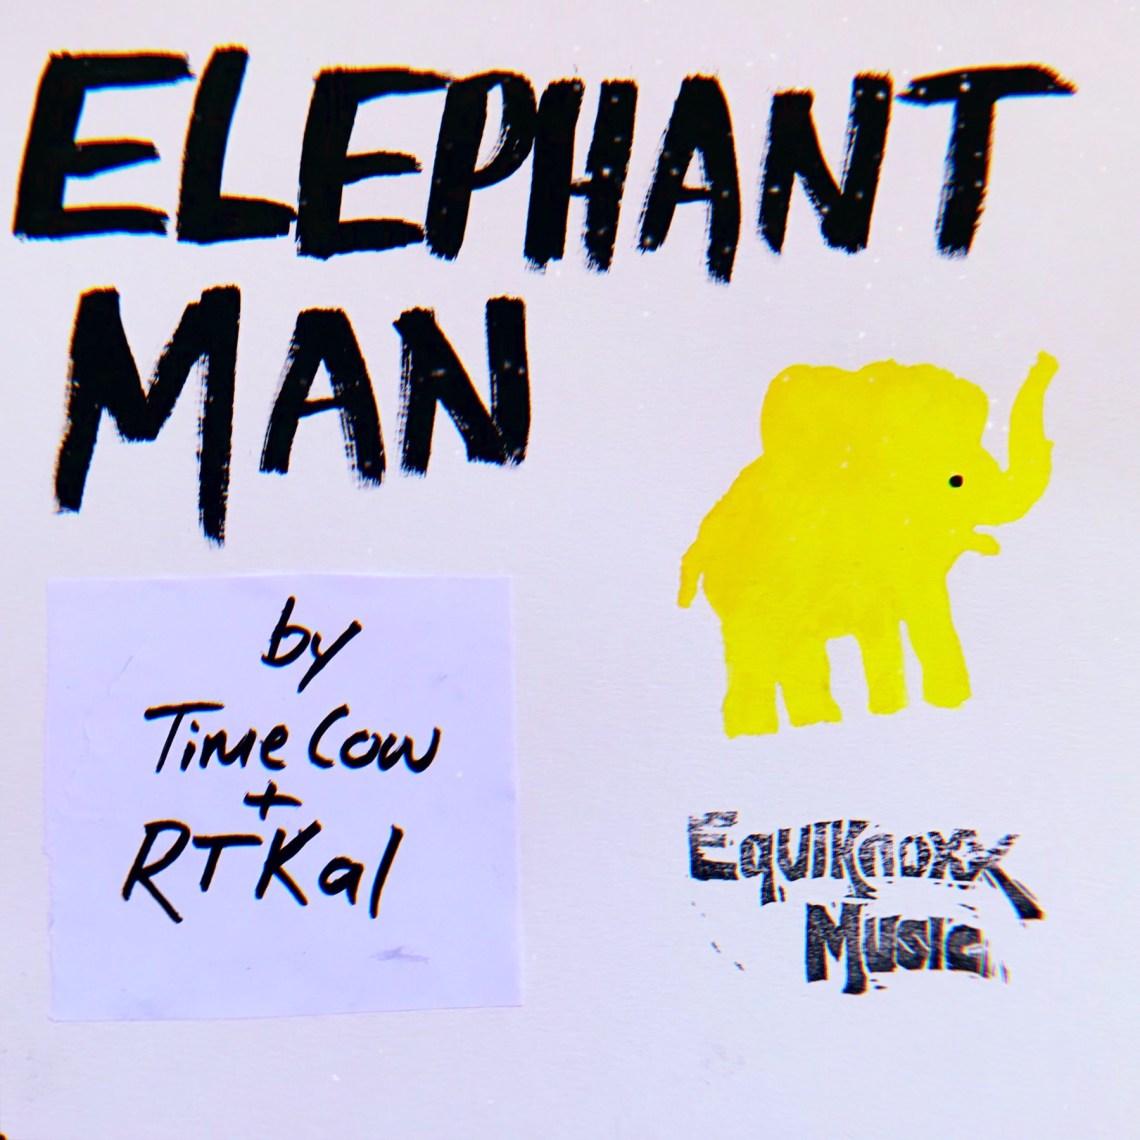 Equiknoxx Music - Elephant Man